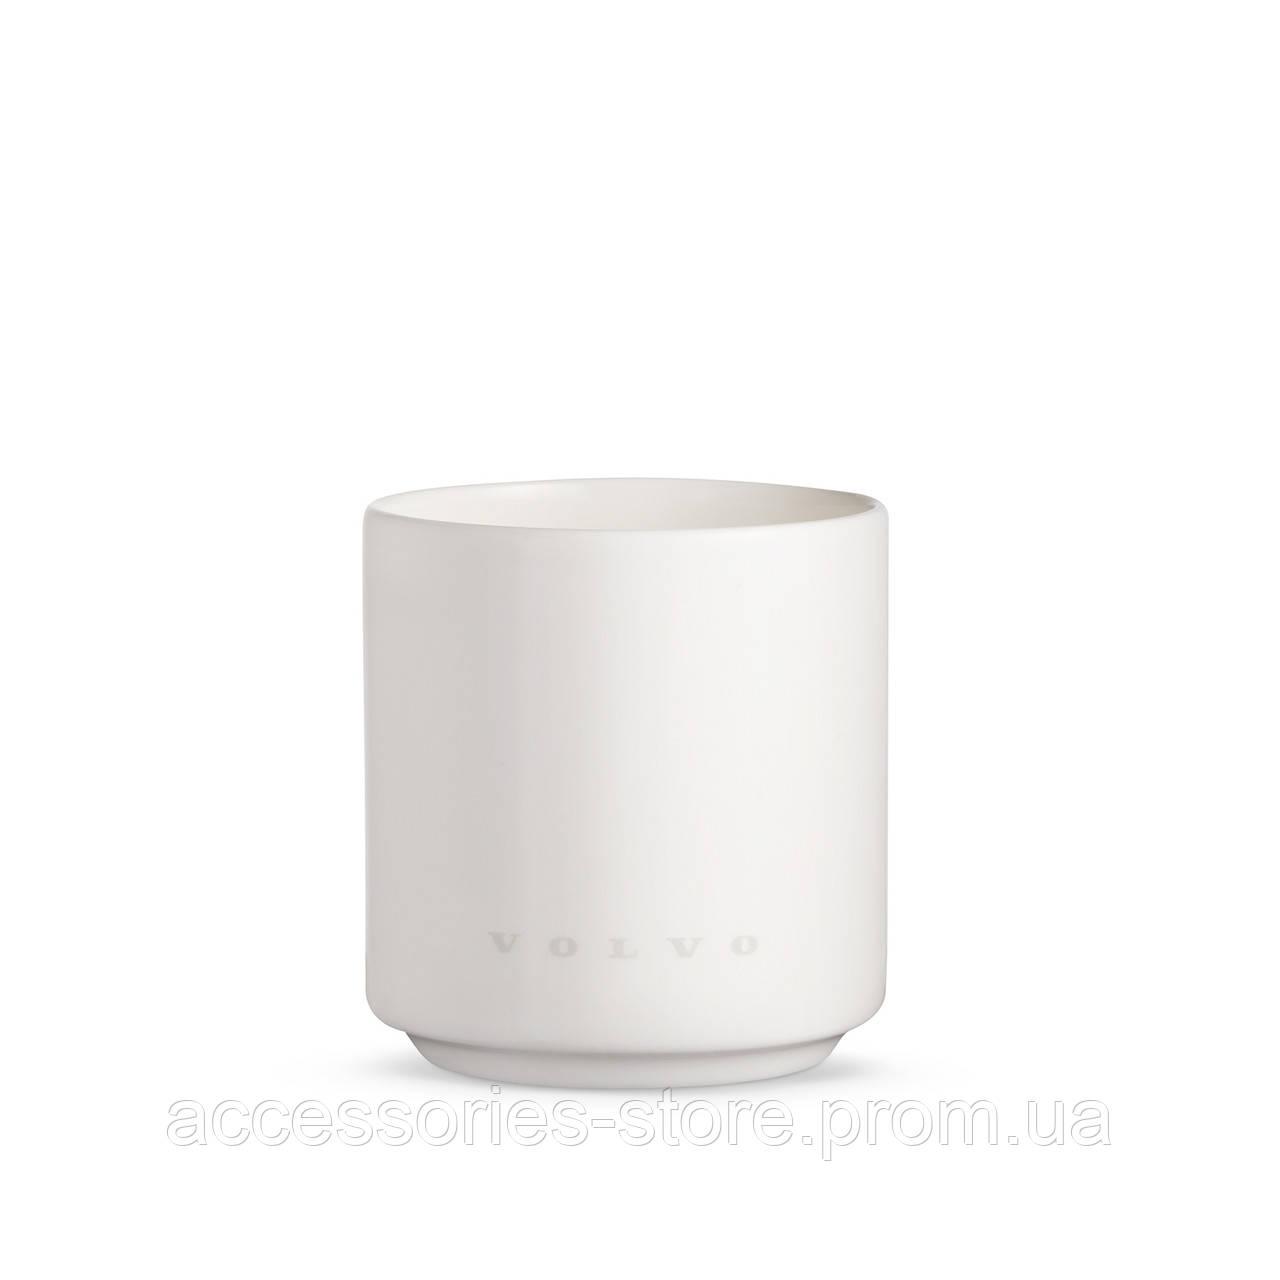 Фарфоровие чашки для еспрессо Volvo Espresso cups 4-pack, white